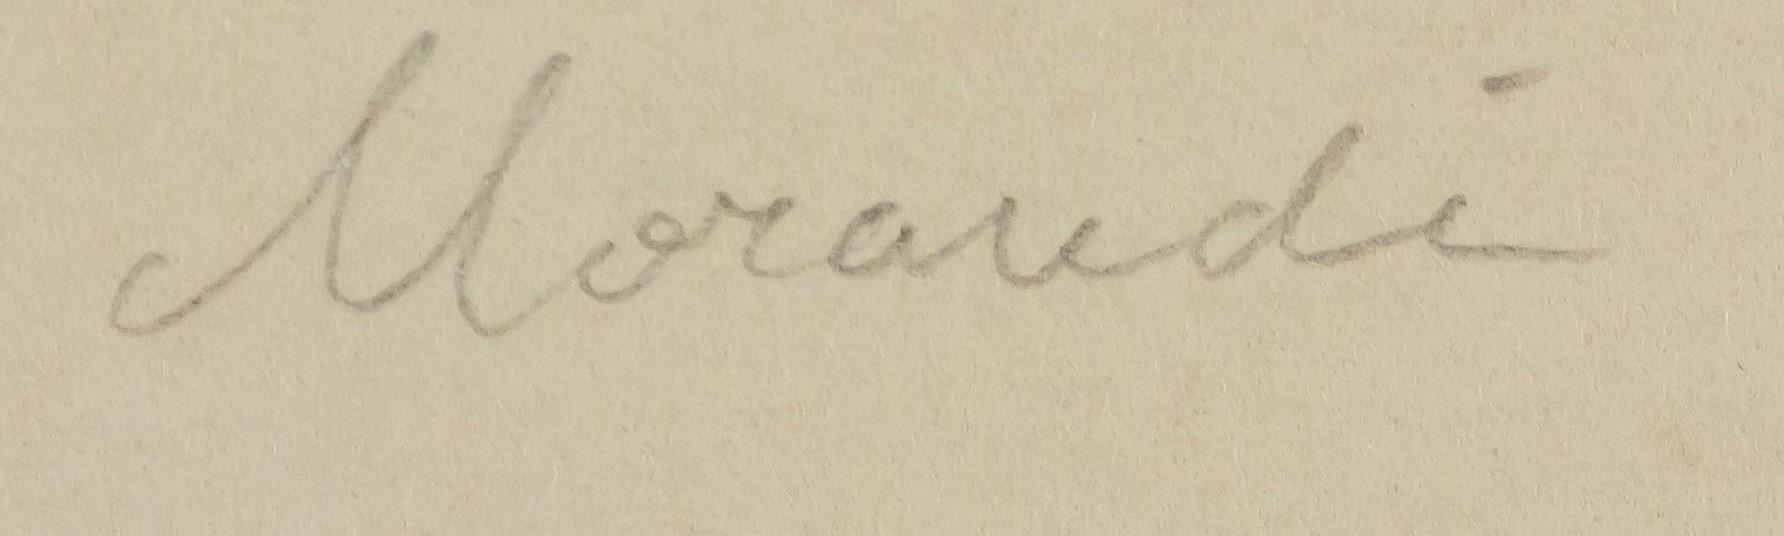 expertise signature giorgio morandi